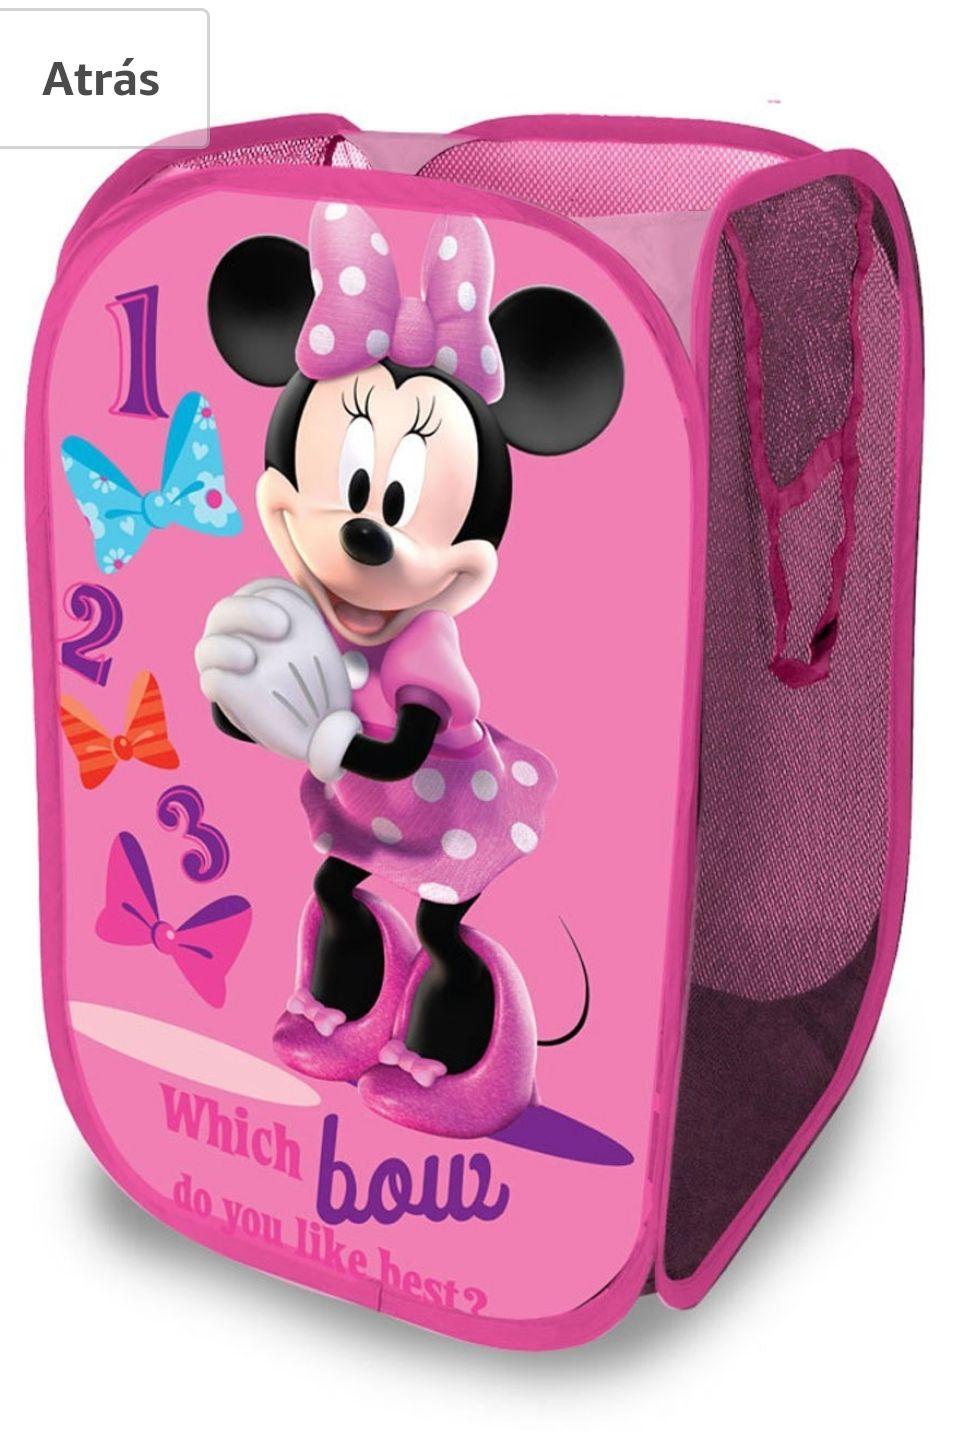 Amazon México: Contenedor para ropa sucia o juguetes de Minnie Disney